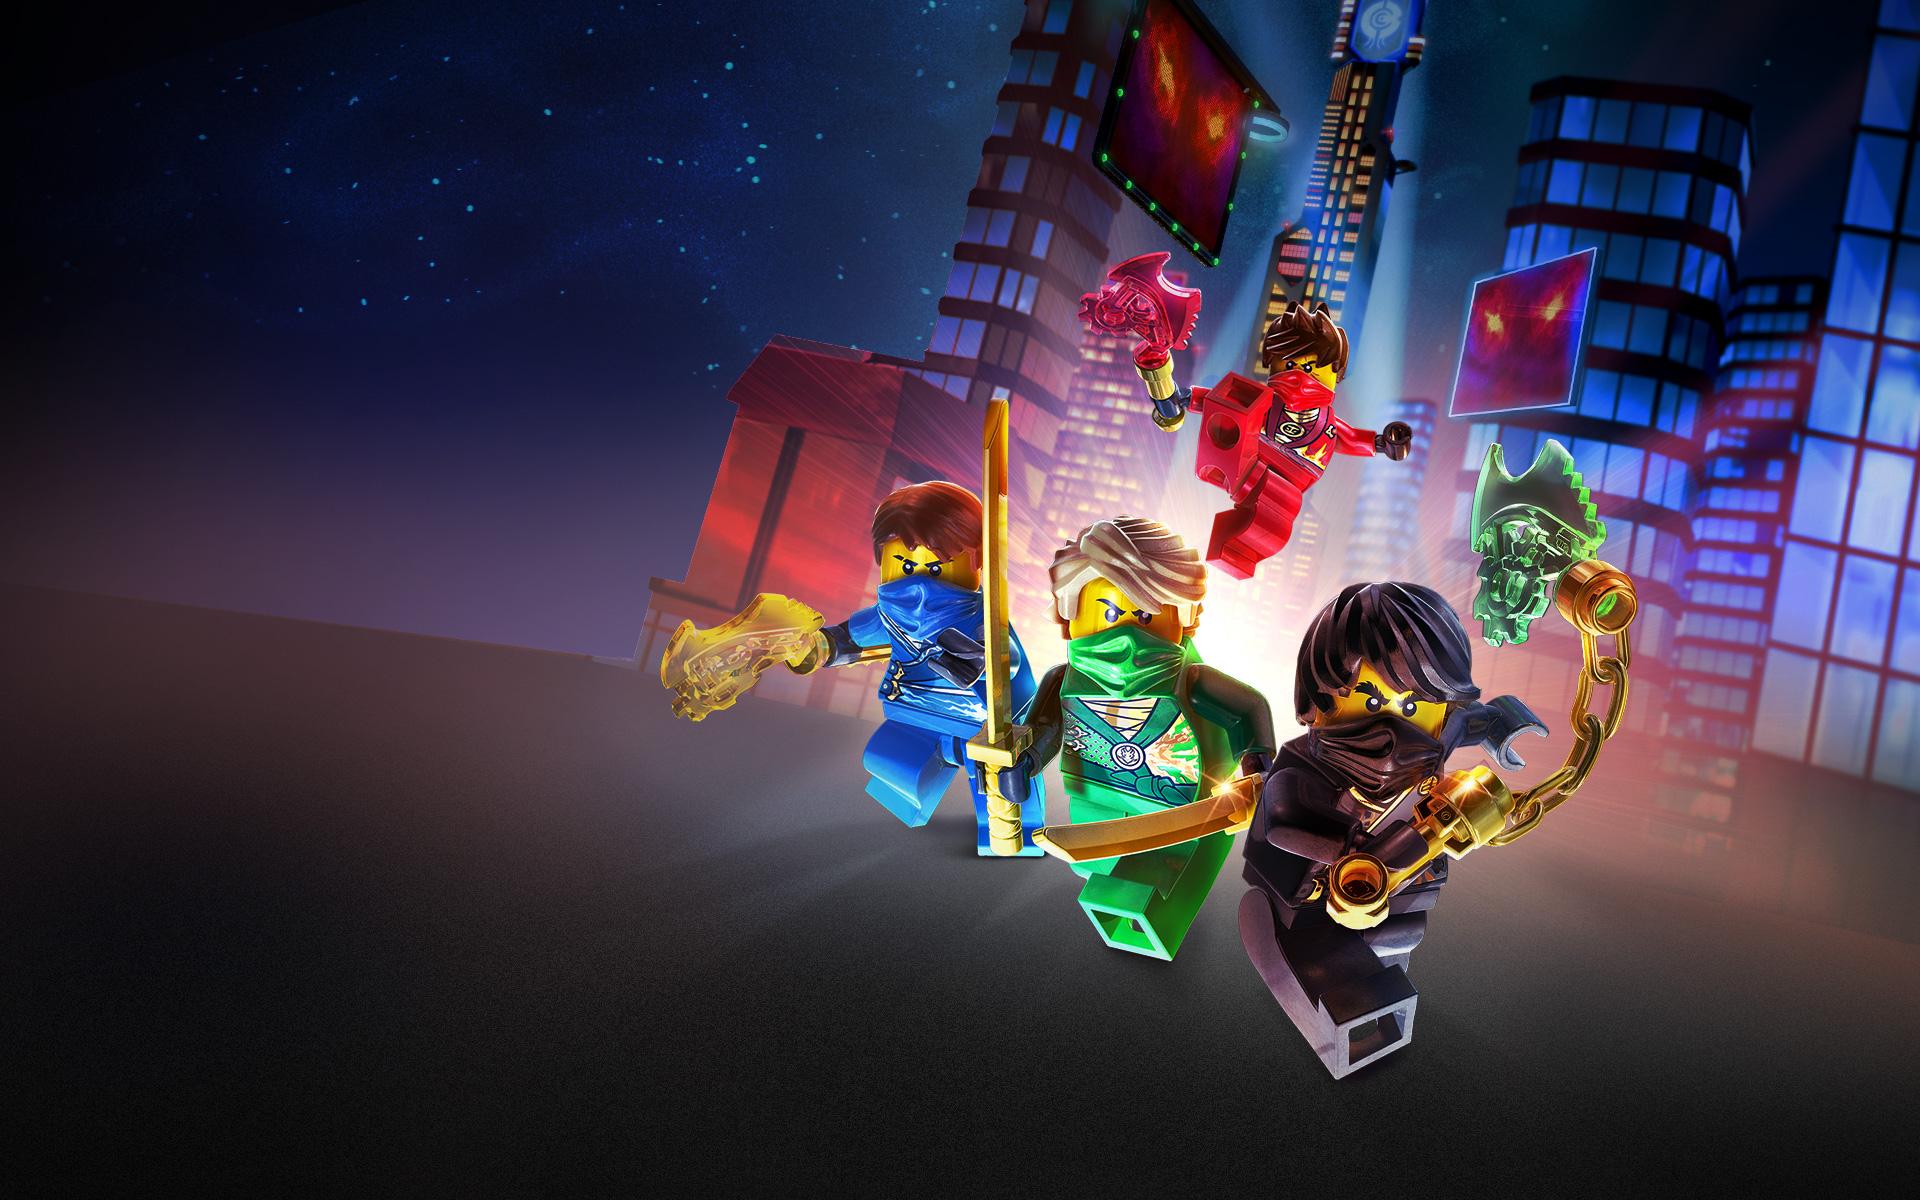 Coloring Pages Lego Images Ausmalbilder Lego Ninjago Zane ... | 1200x1920